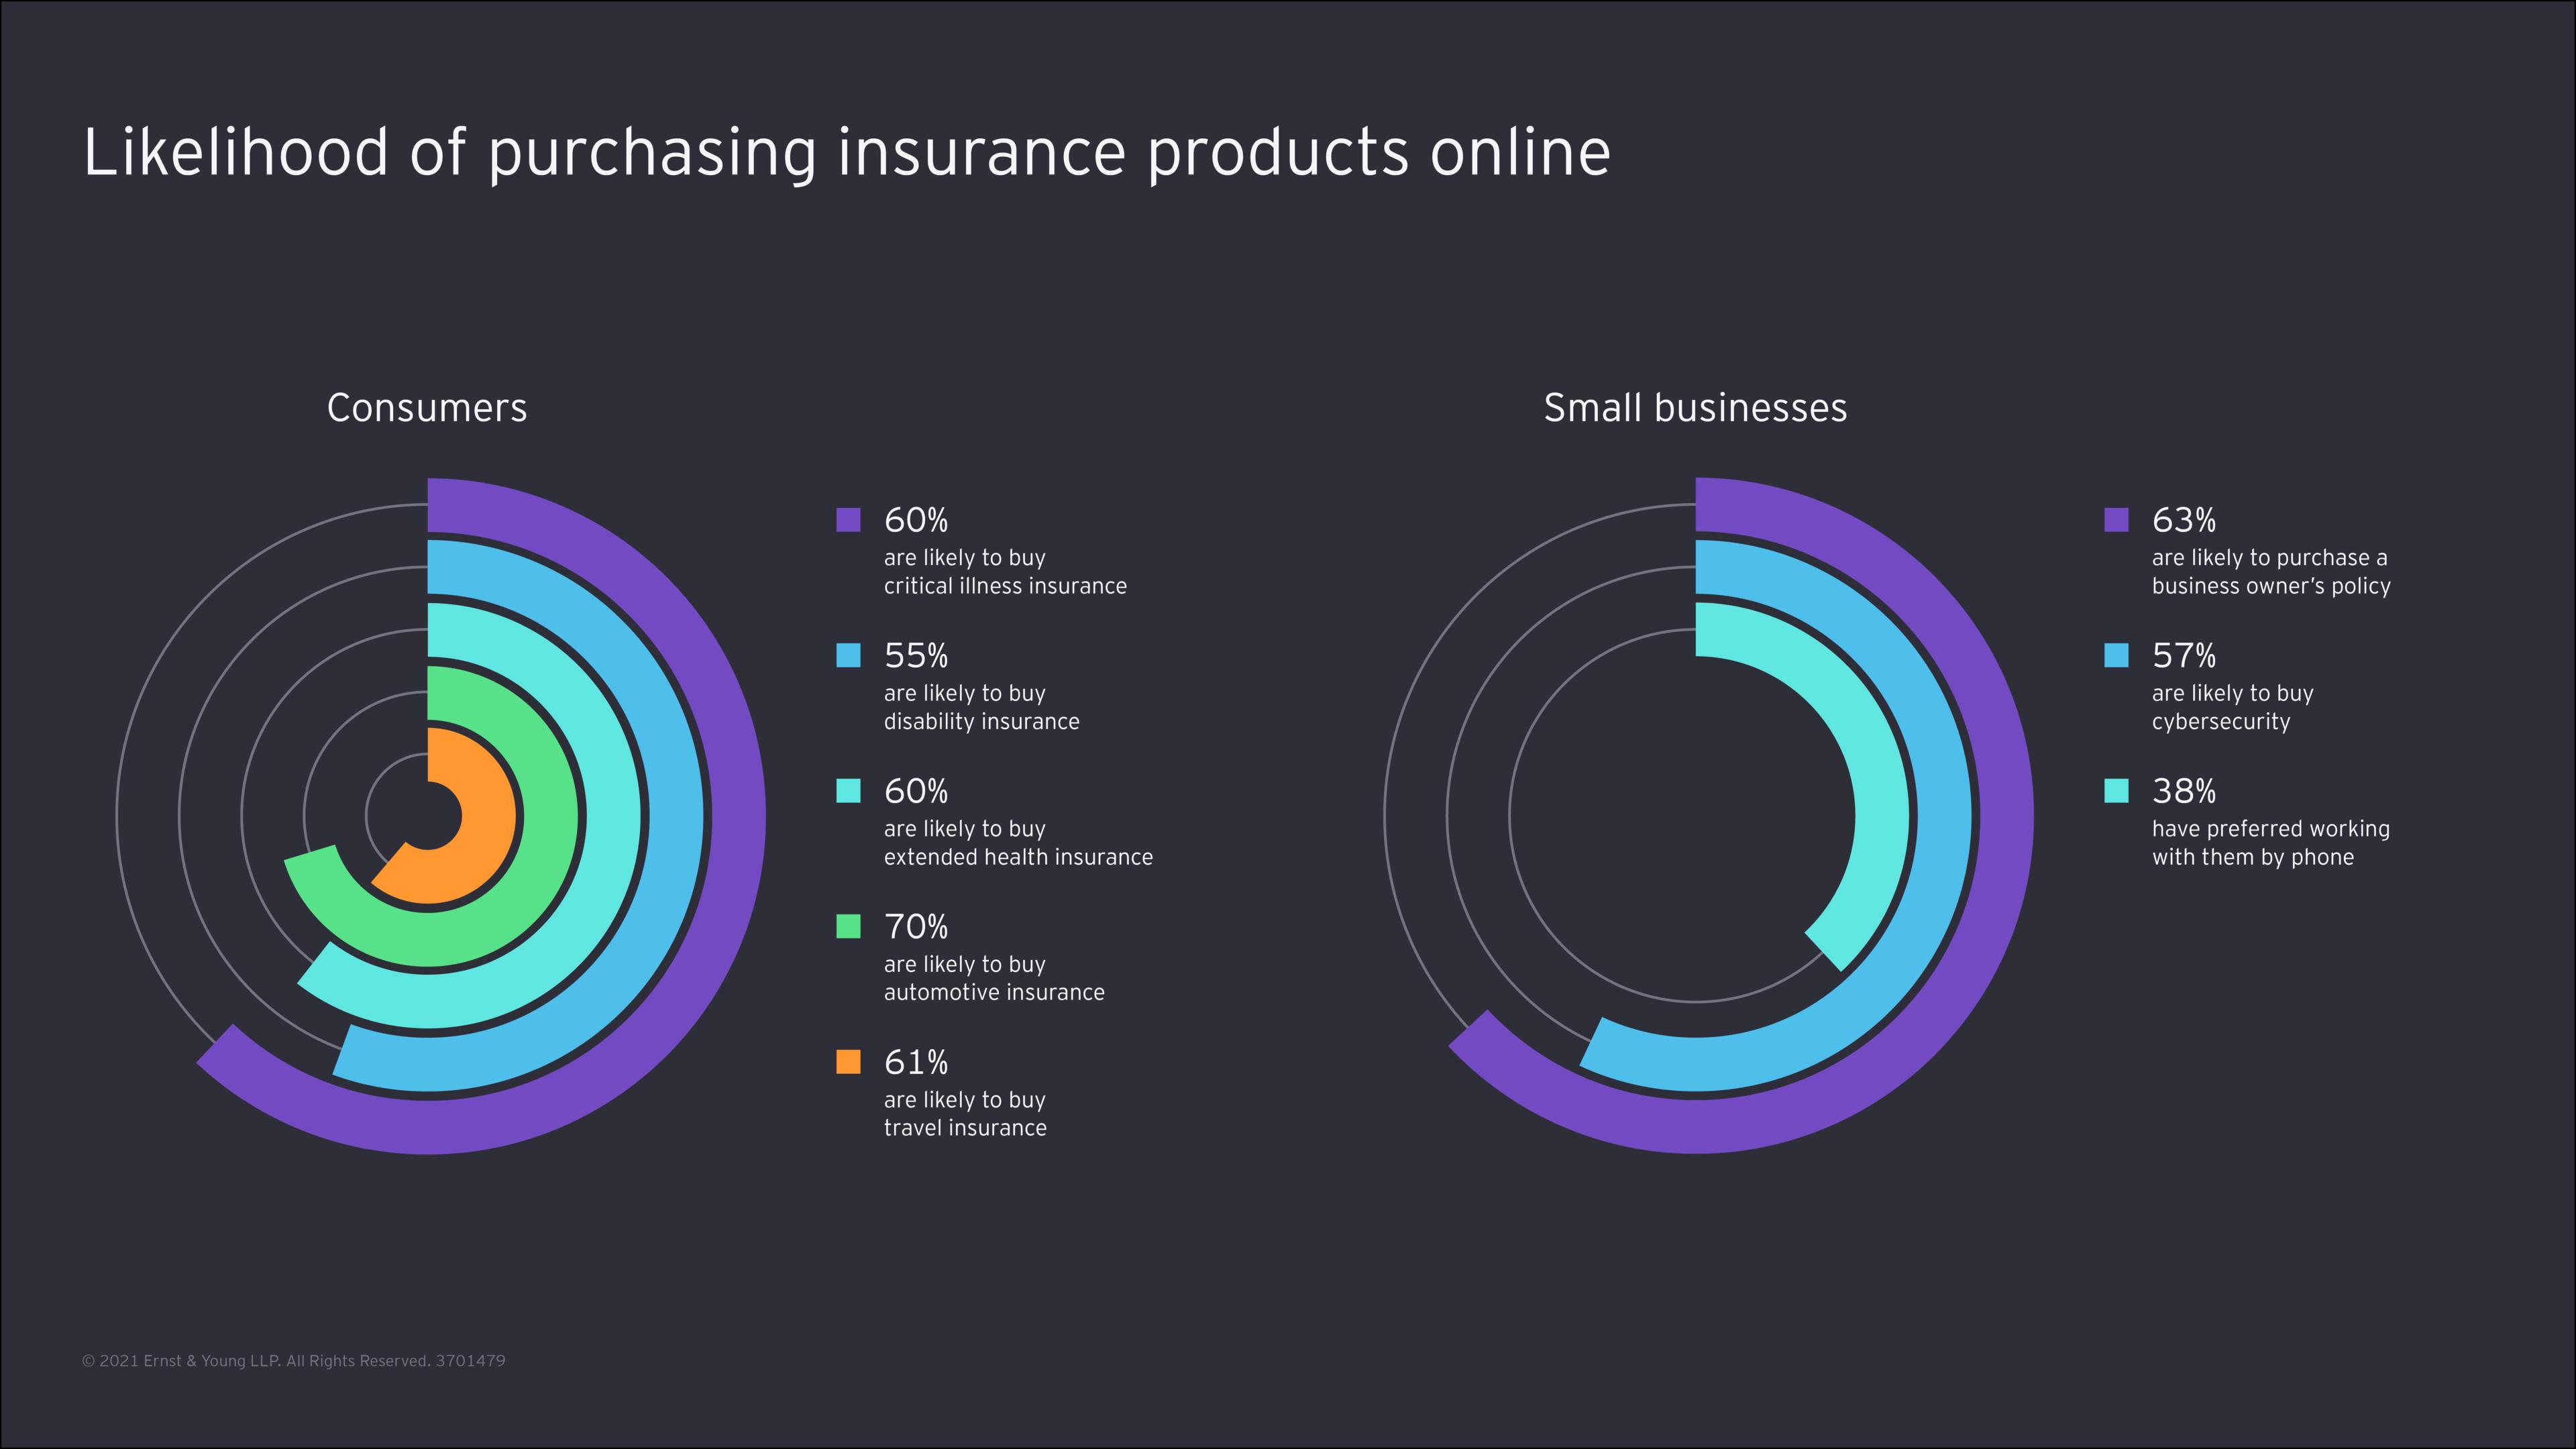 Likelihood of purchasing insurance product online